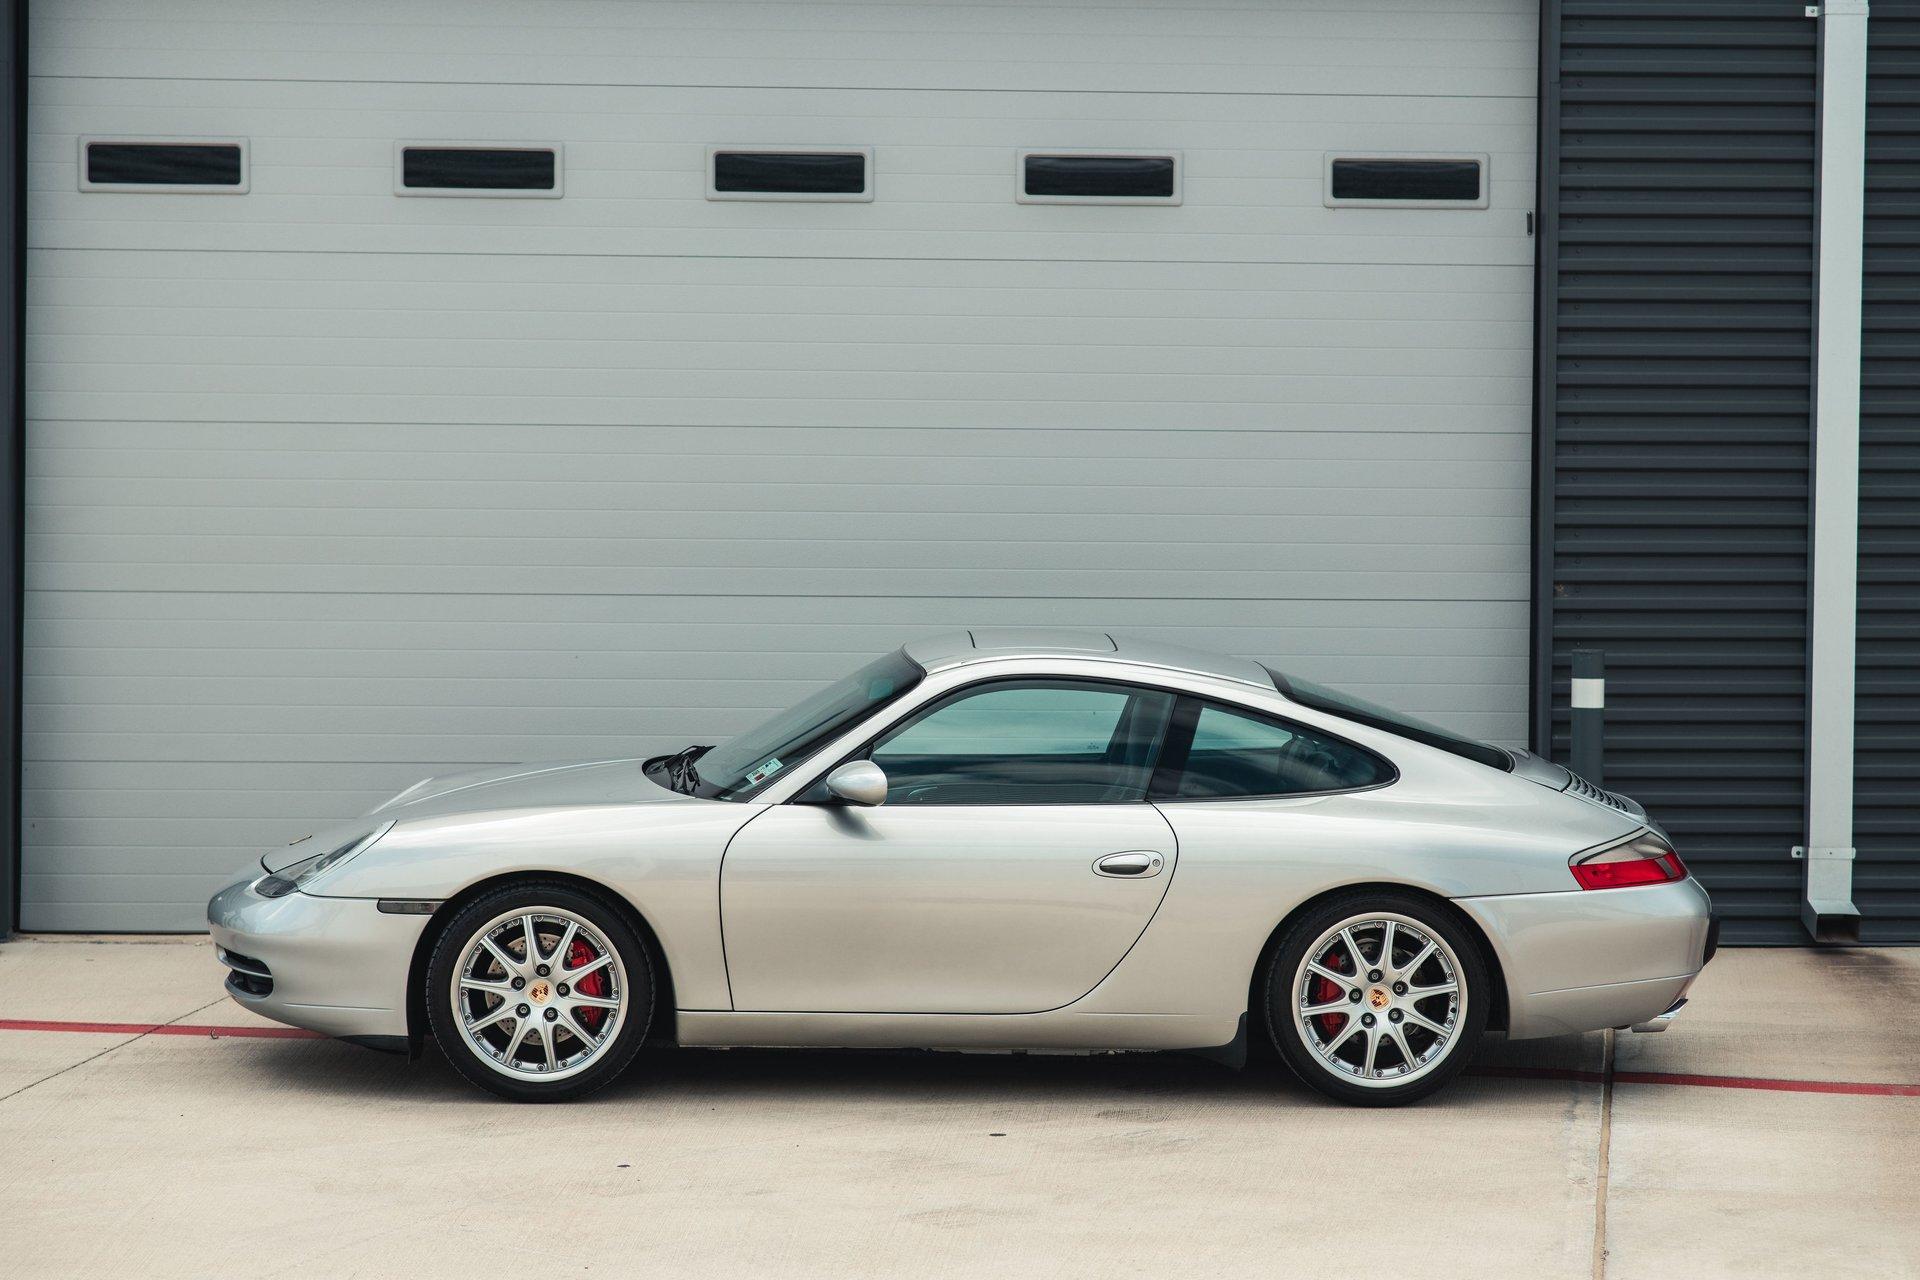 1999 porsche 911 carrera 2dr carrera cpe 6 spd manual